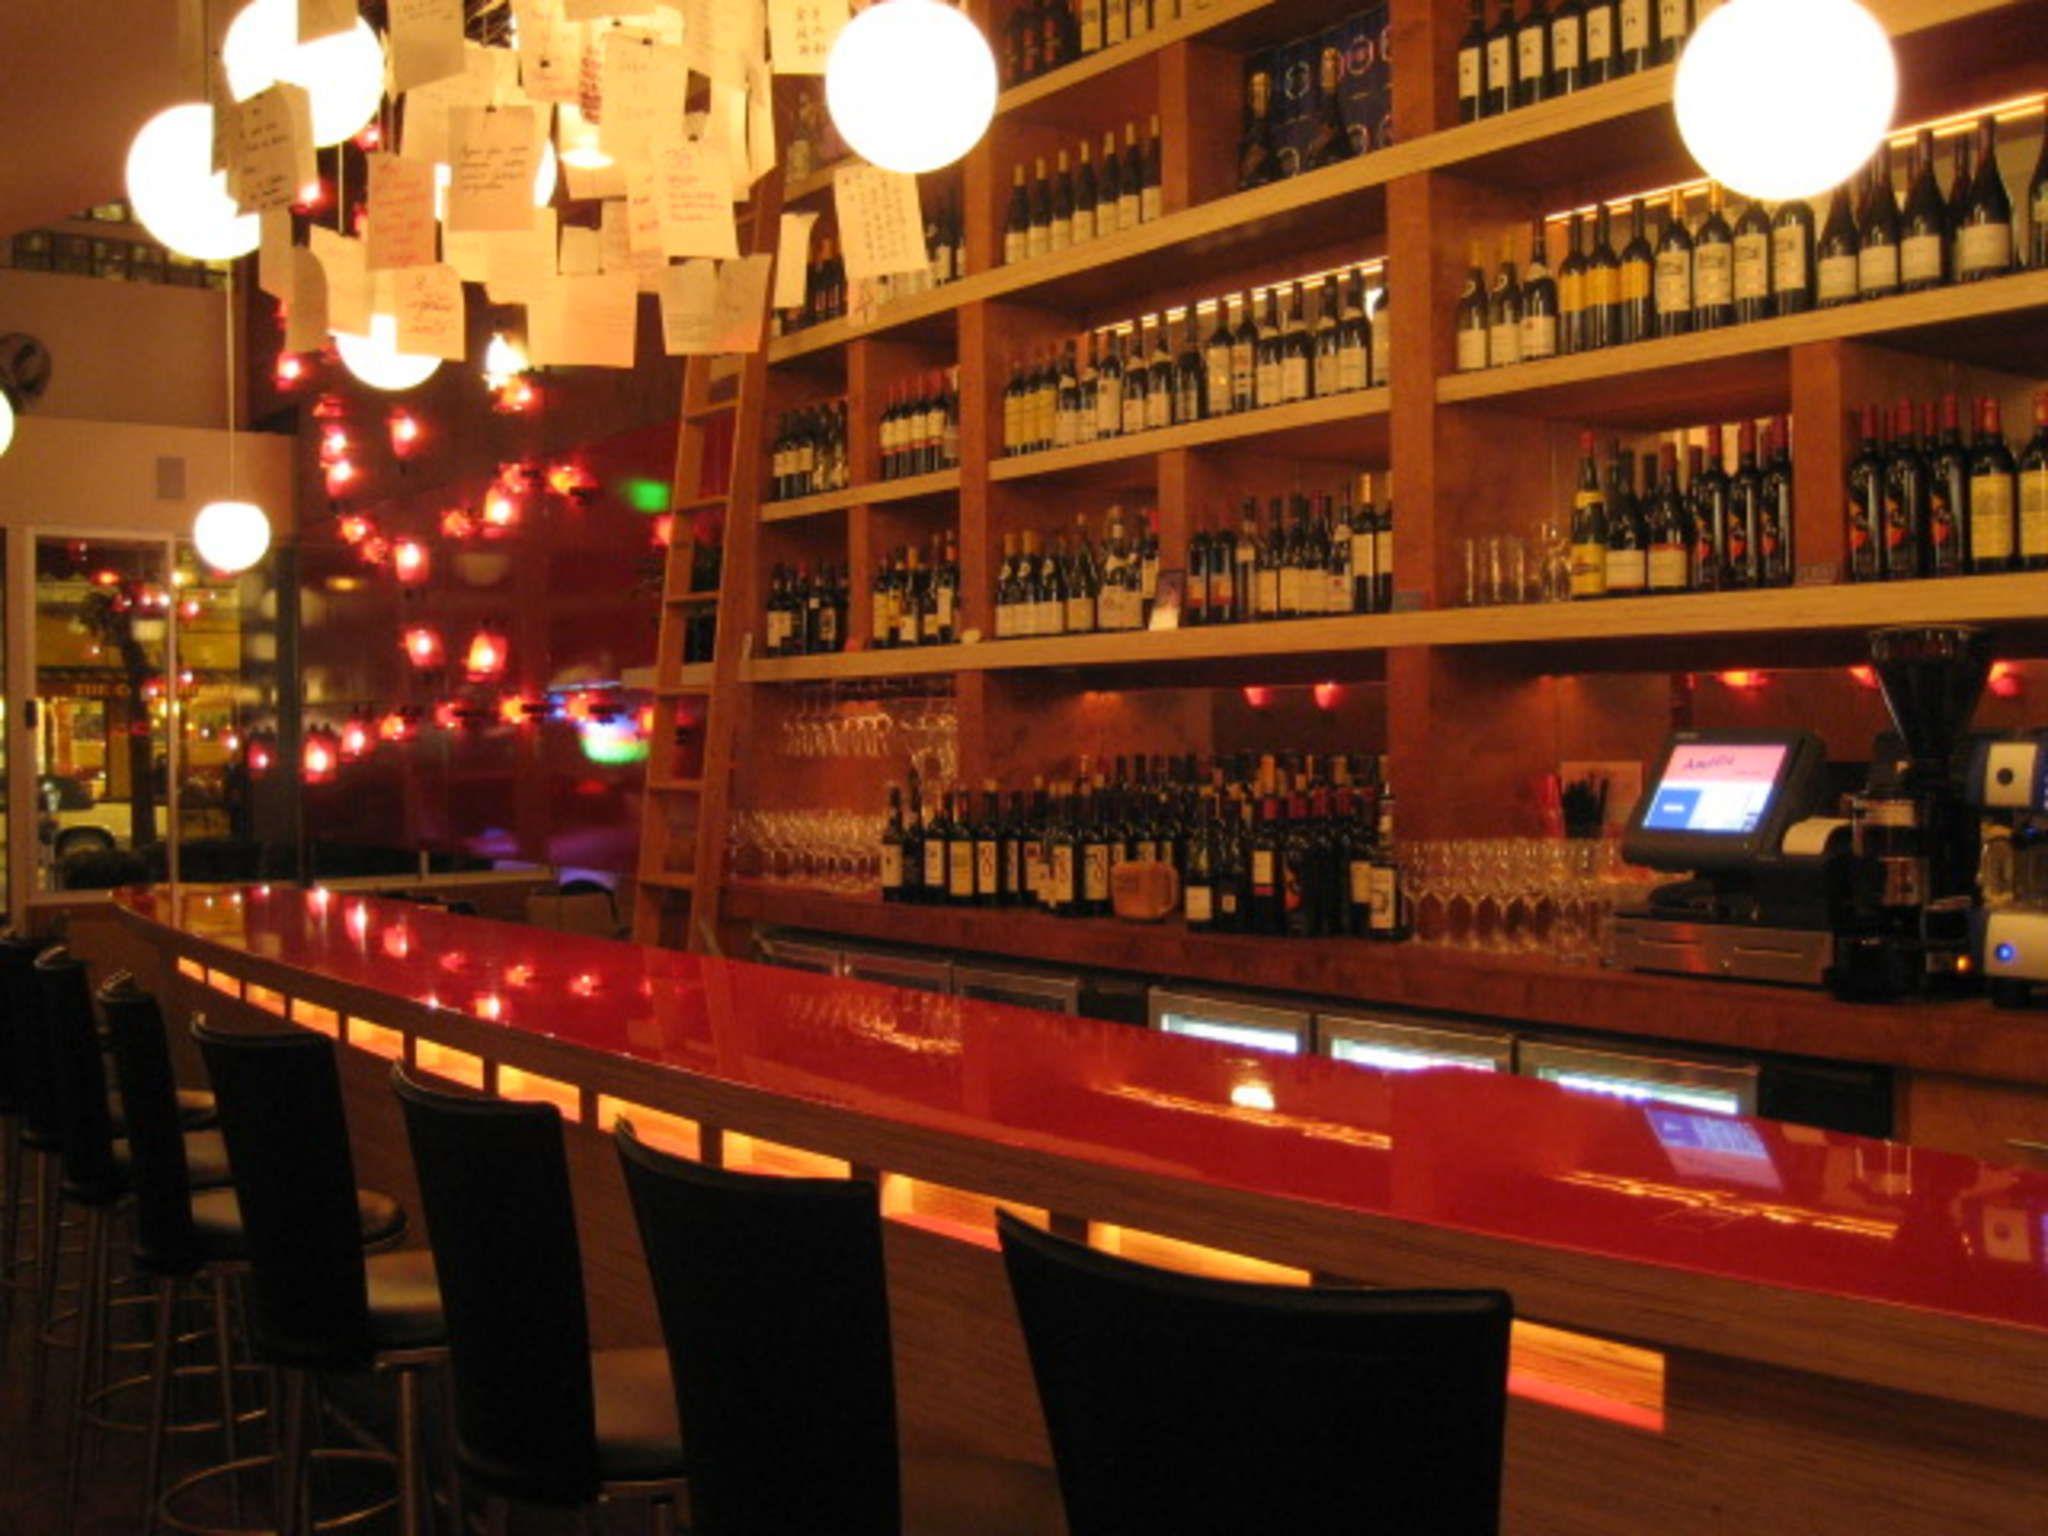 Amelie Wine Bar On Polk St In San Francisco Wine Bar San Francisco Wine Bar San Francisco Bars